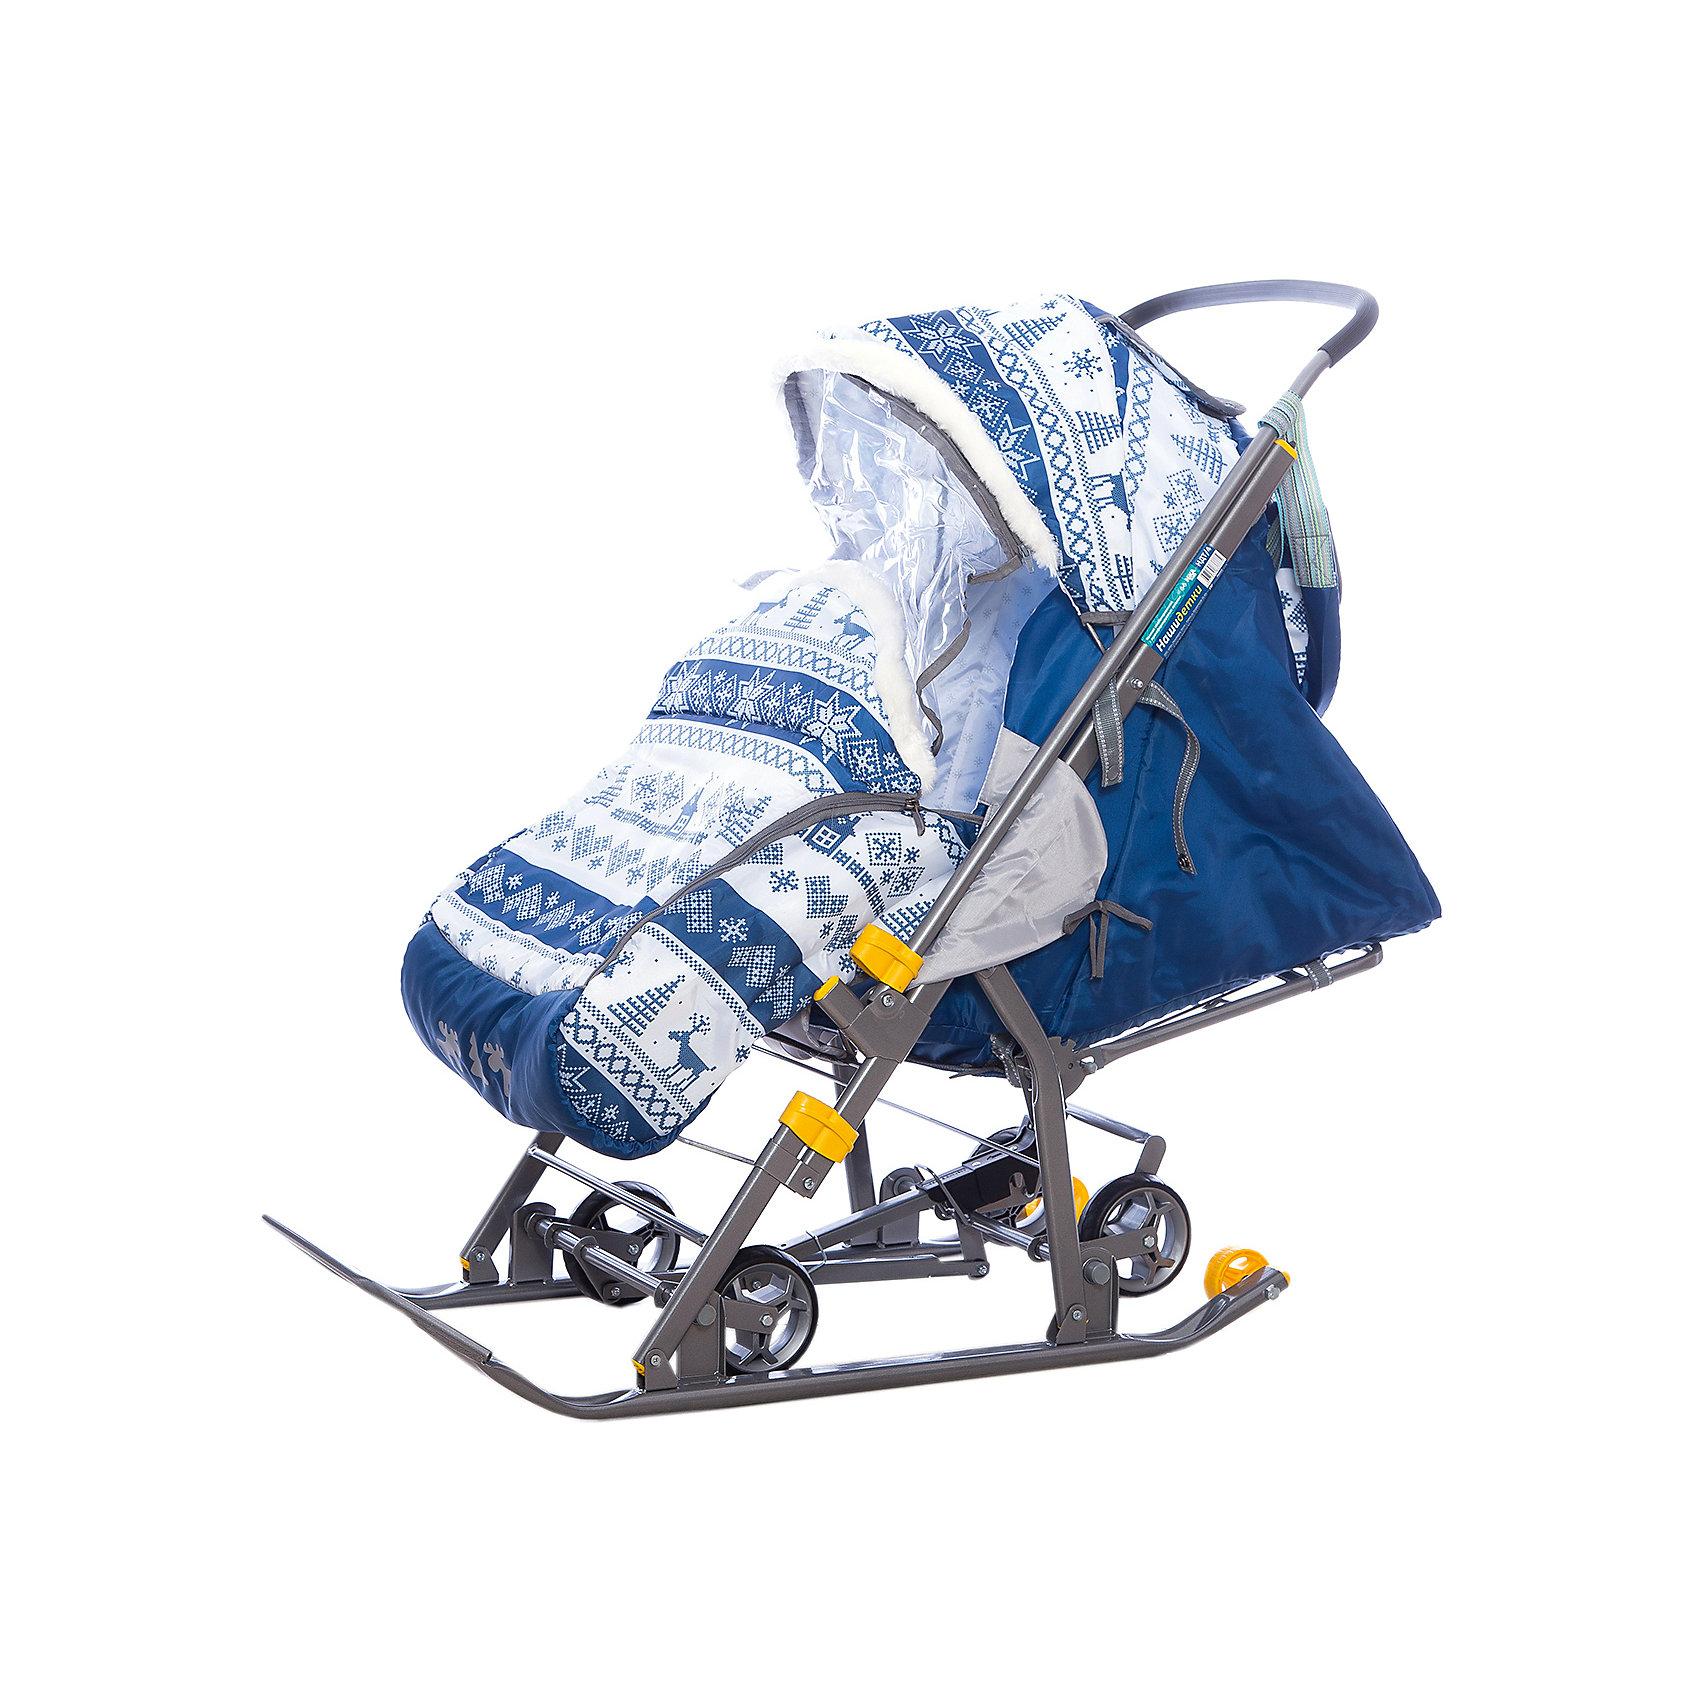 Санки-коляска Ника  Нашидетки, принт скандинавcкий синий